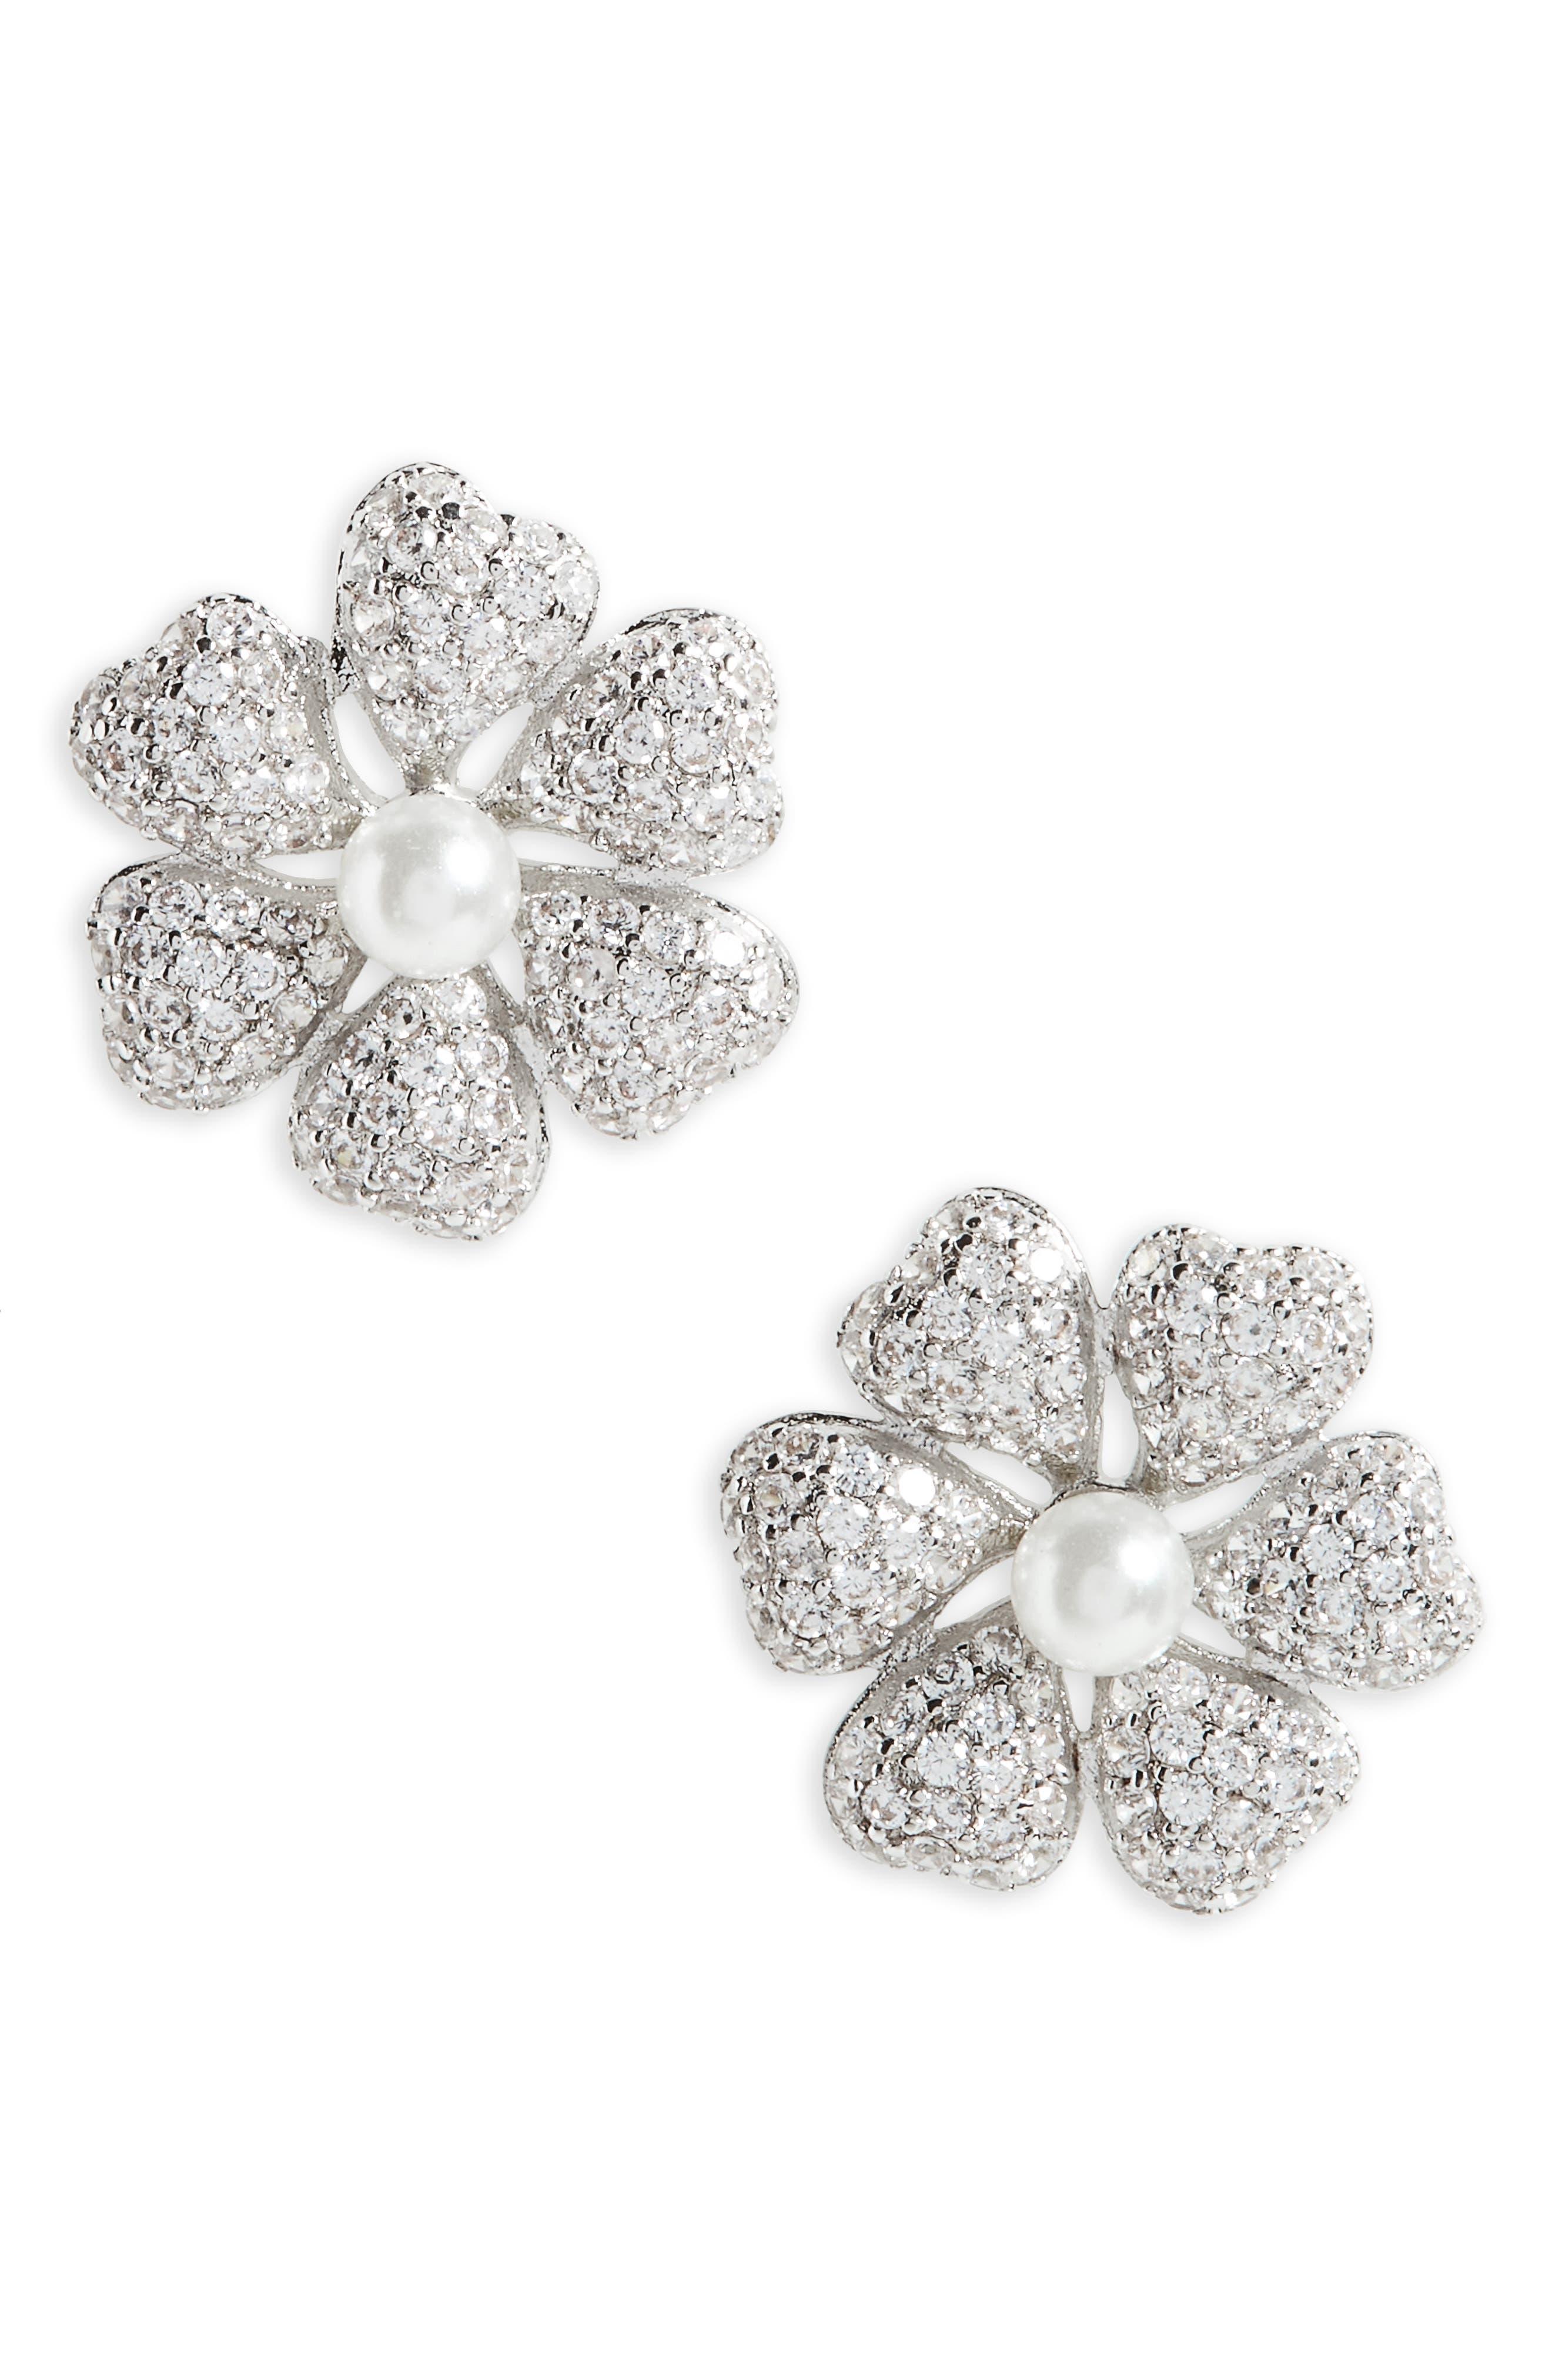 Flower Crystal & Imitation Pearl Stud Earrings,                             Main thumbnail 1, color,                             Ivory Pearl / Silver